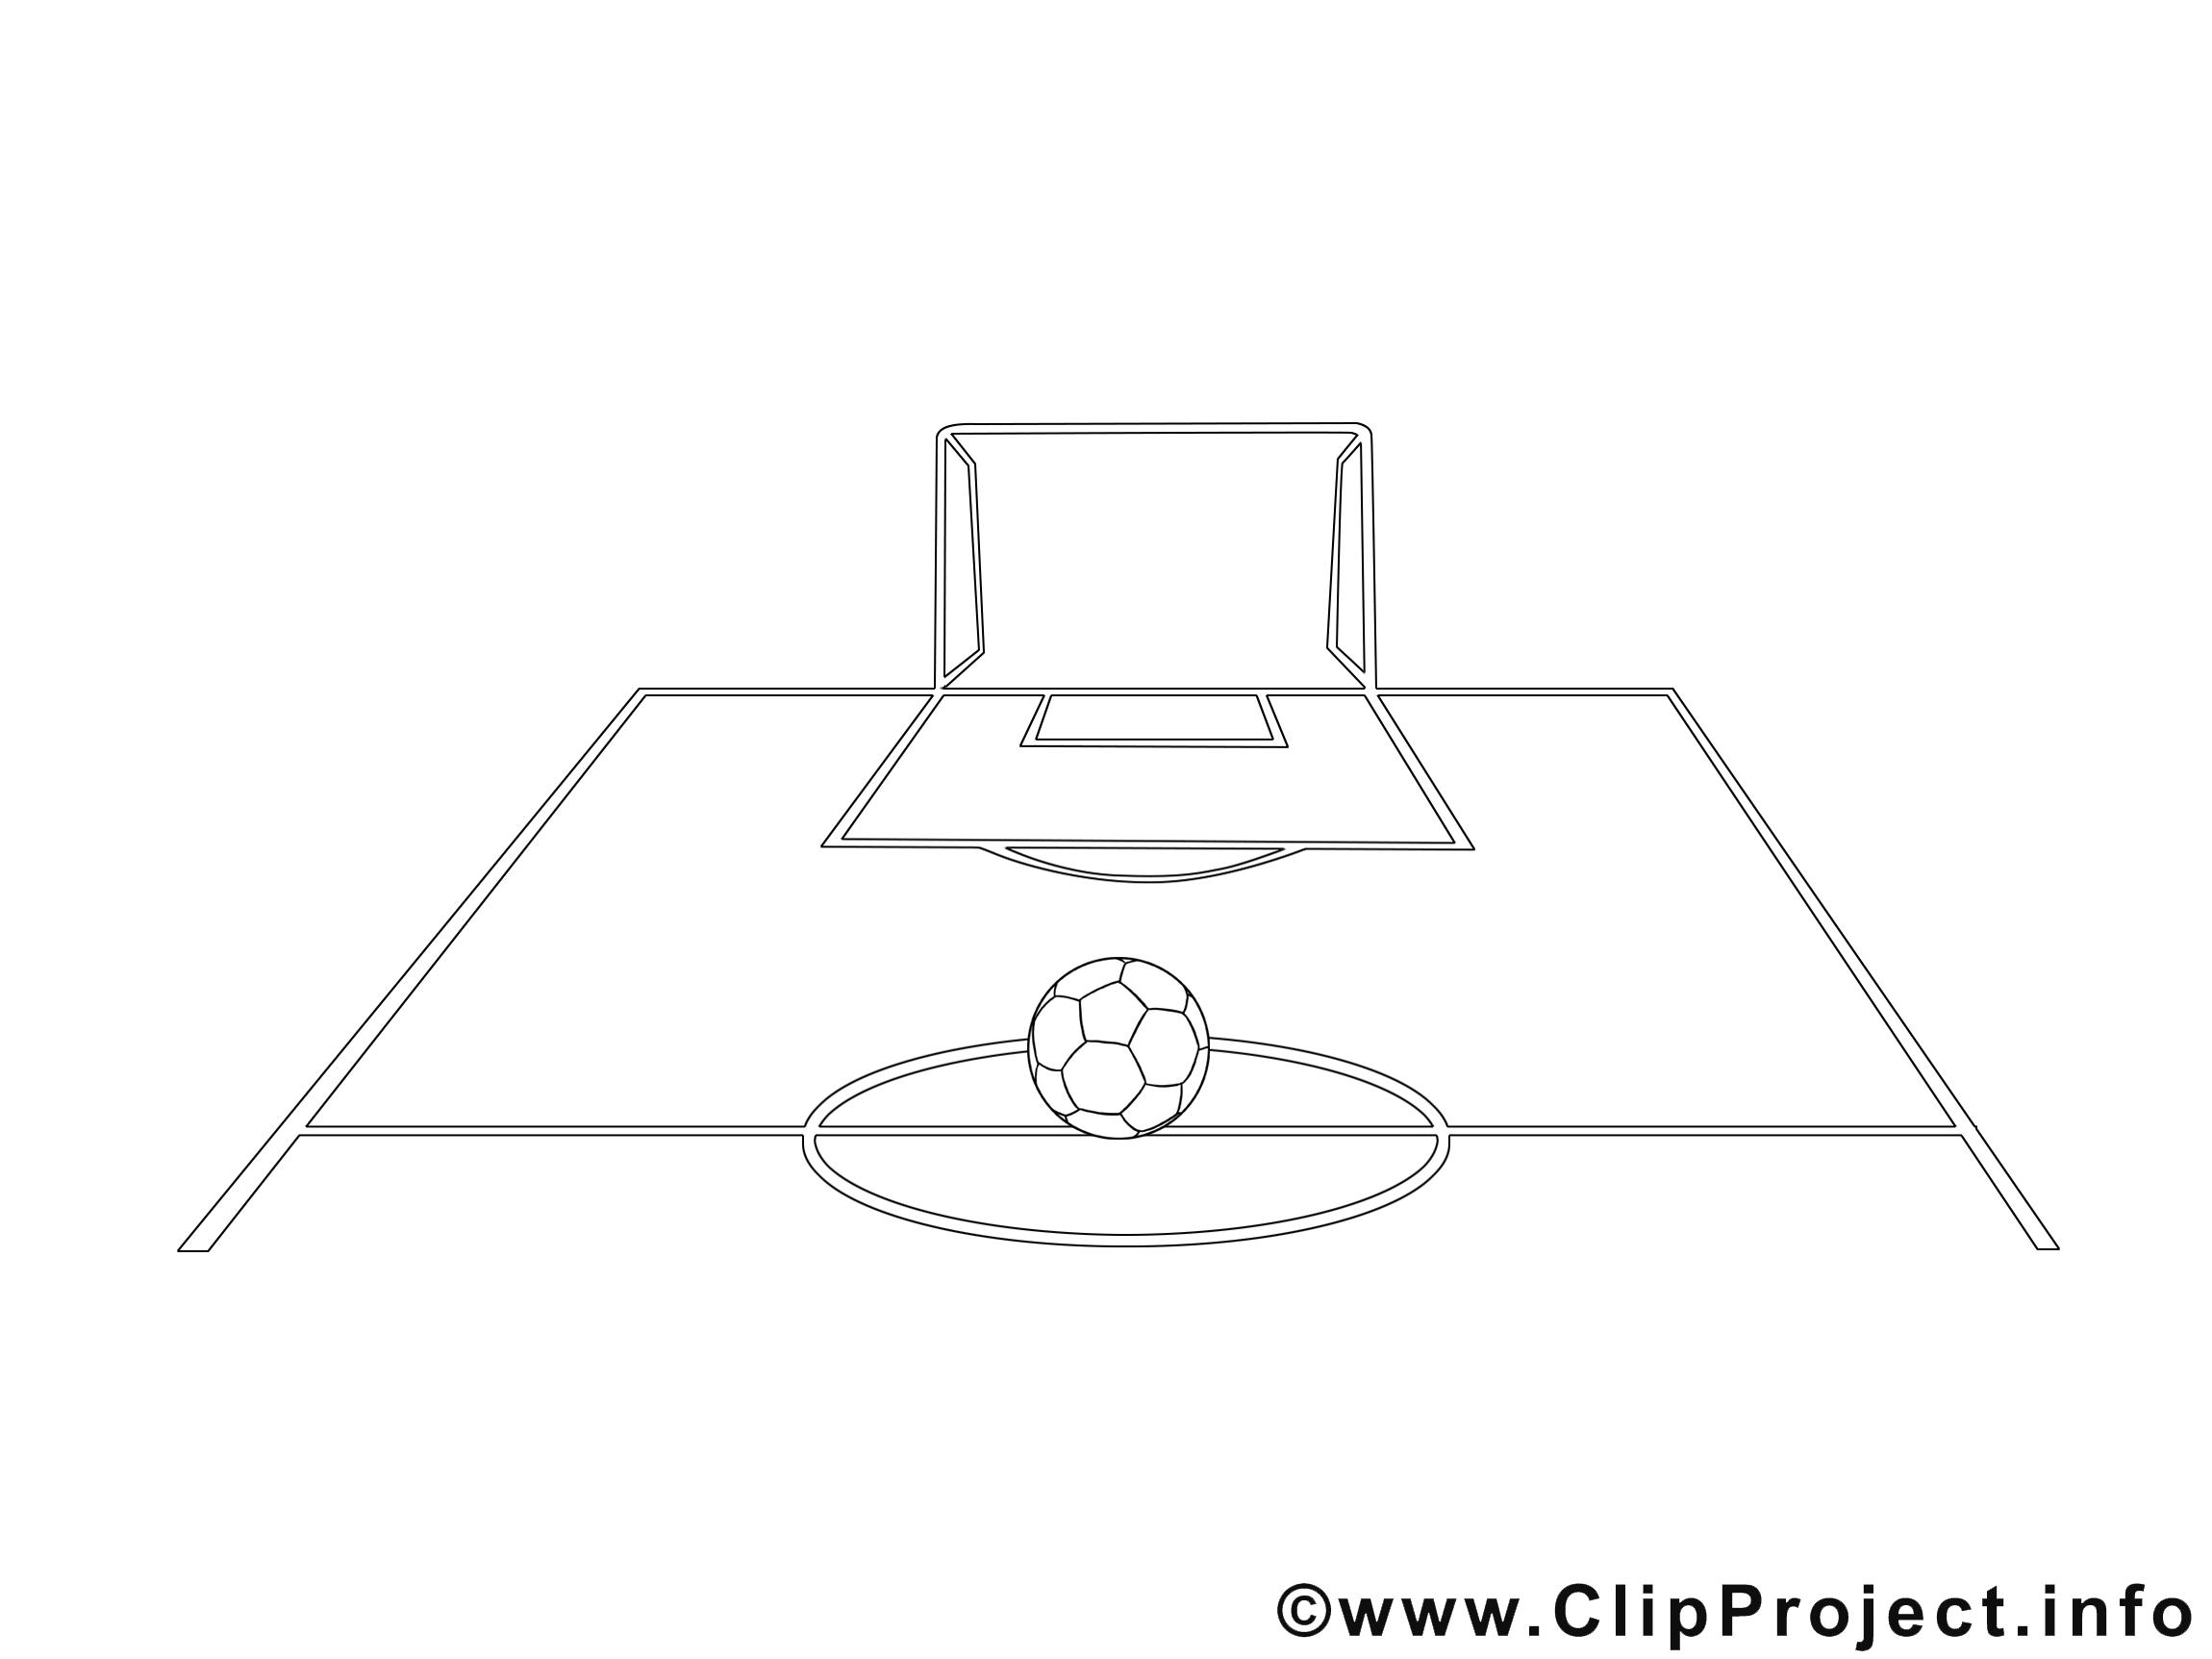 Terrain illustration – Football à imprimer